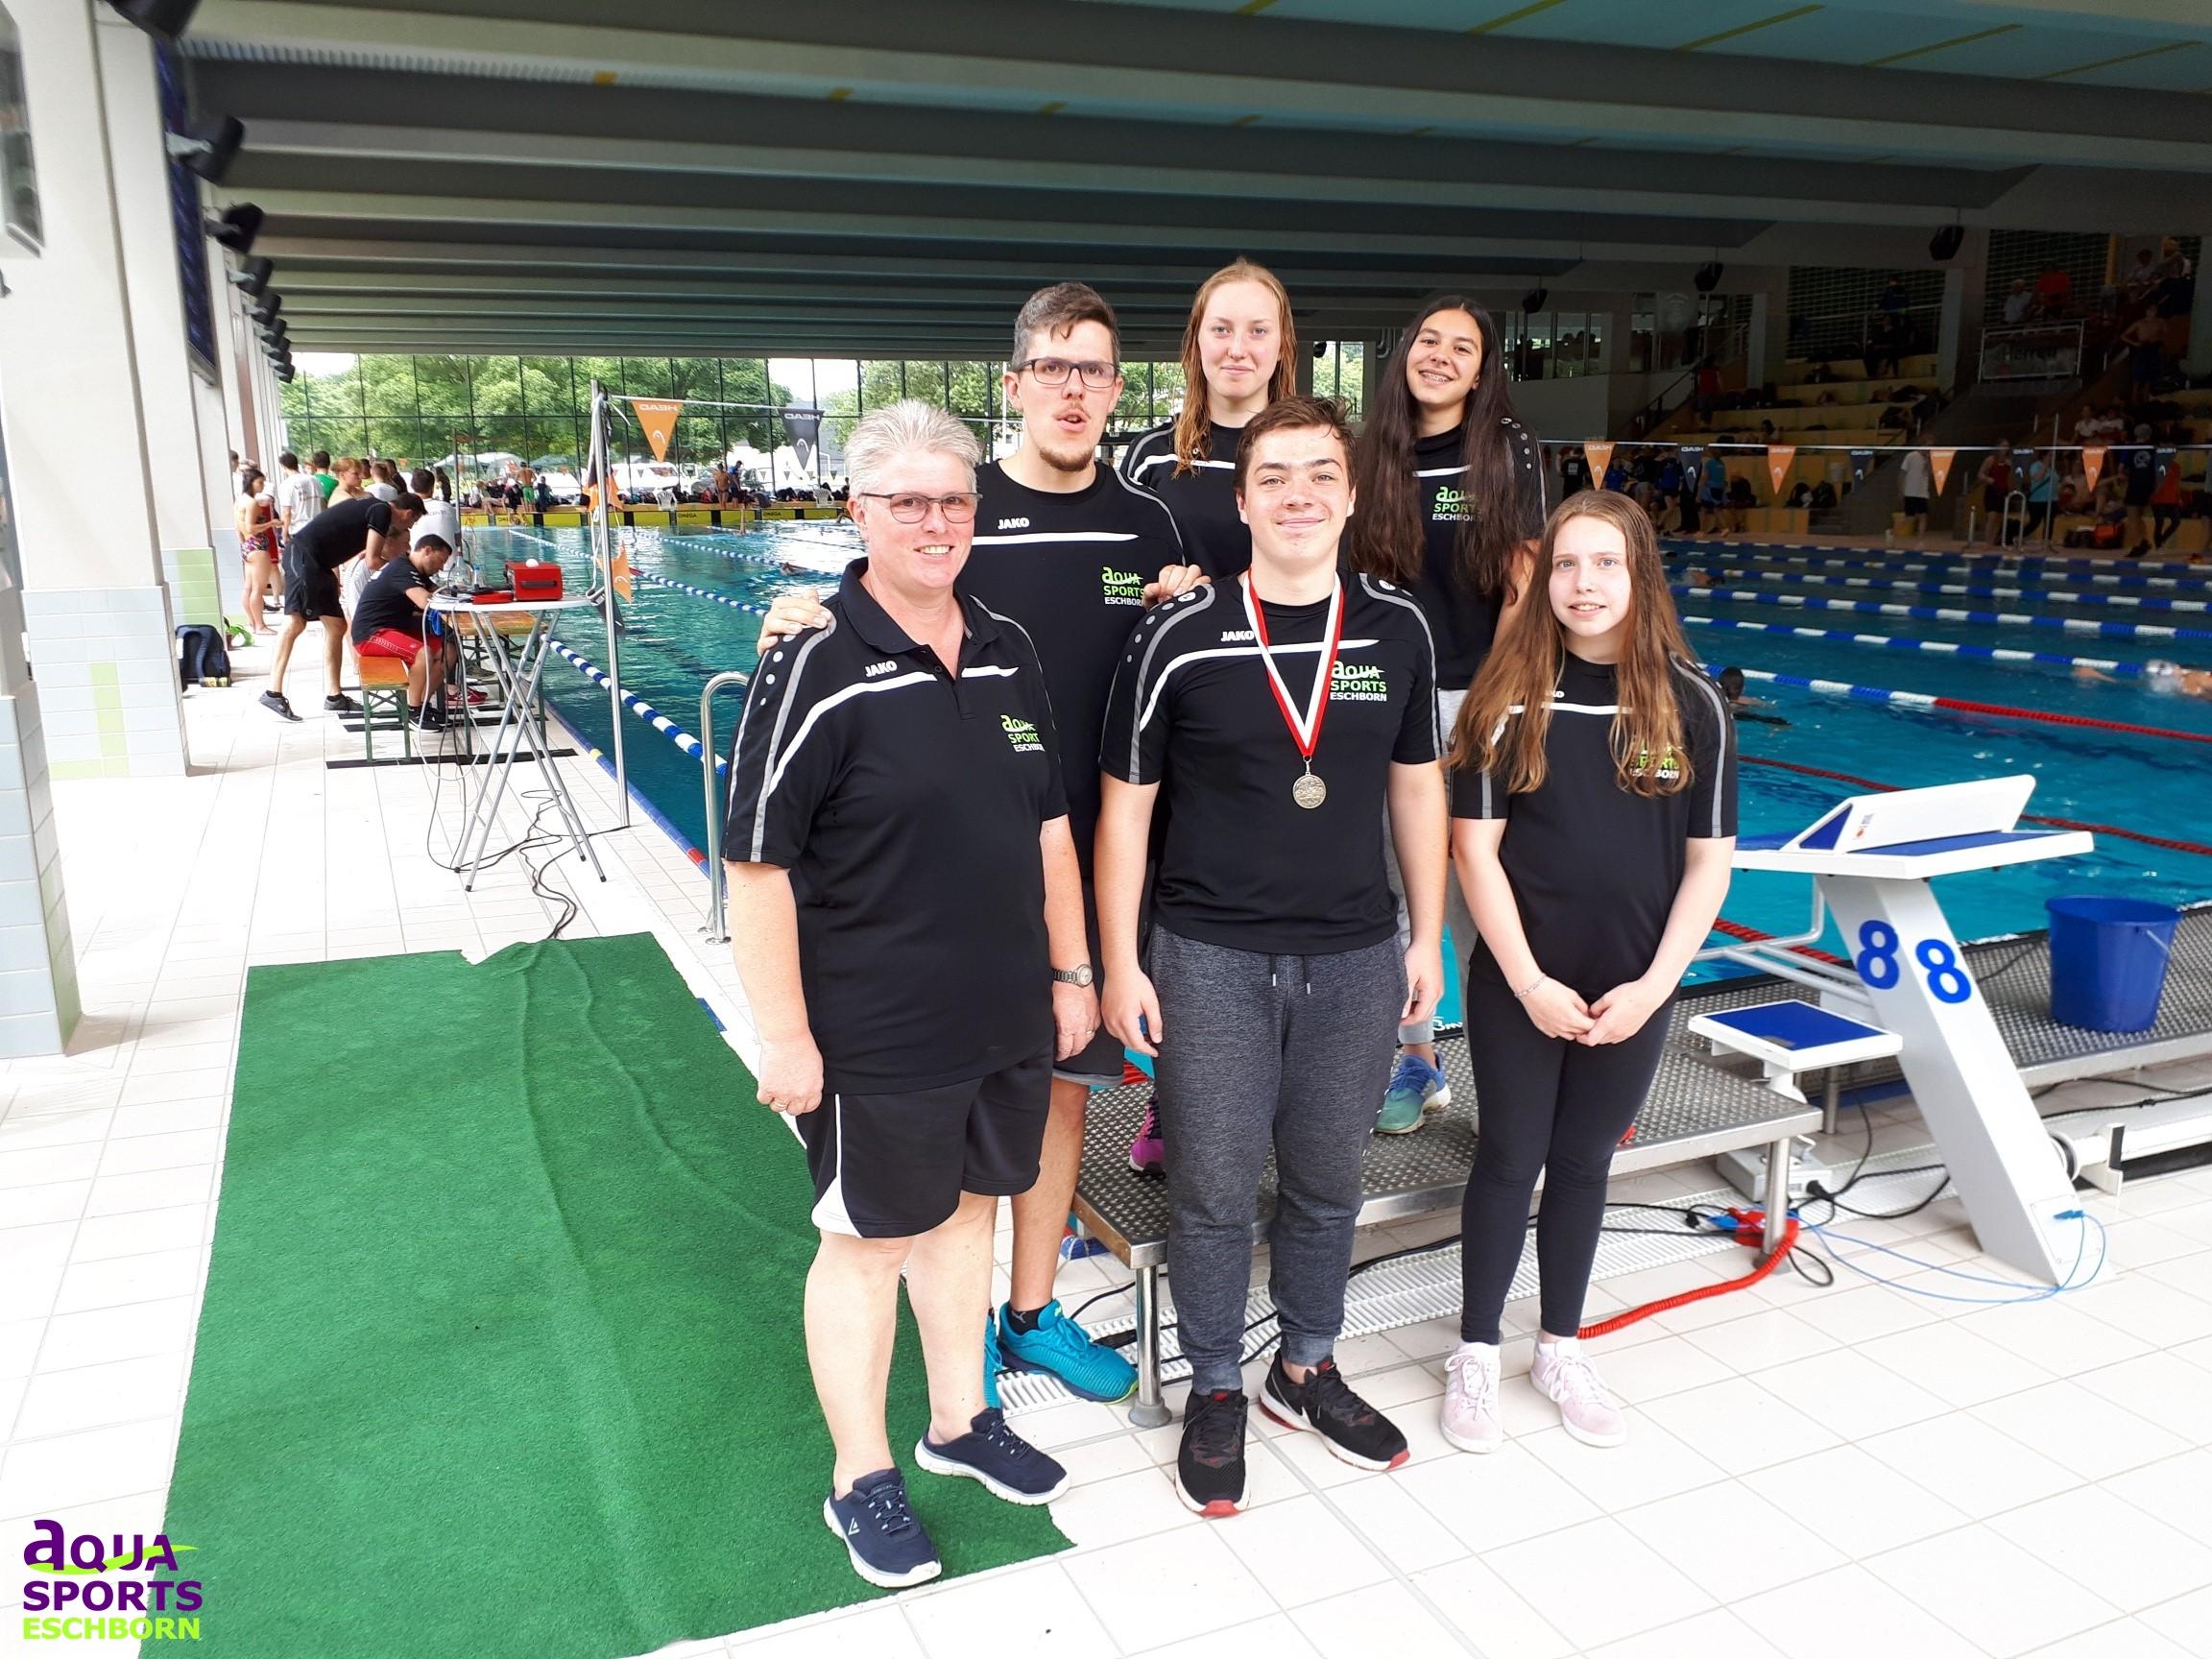 willkommen bei aqua sports eschborn schwimmen  aqua